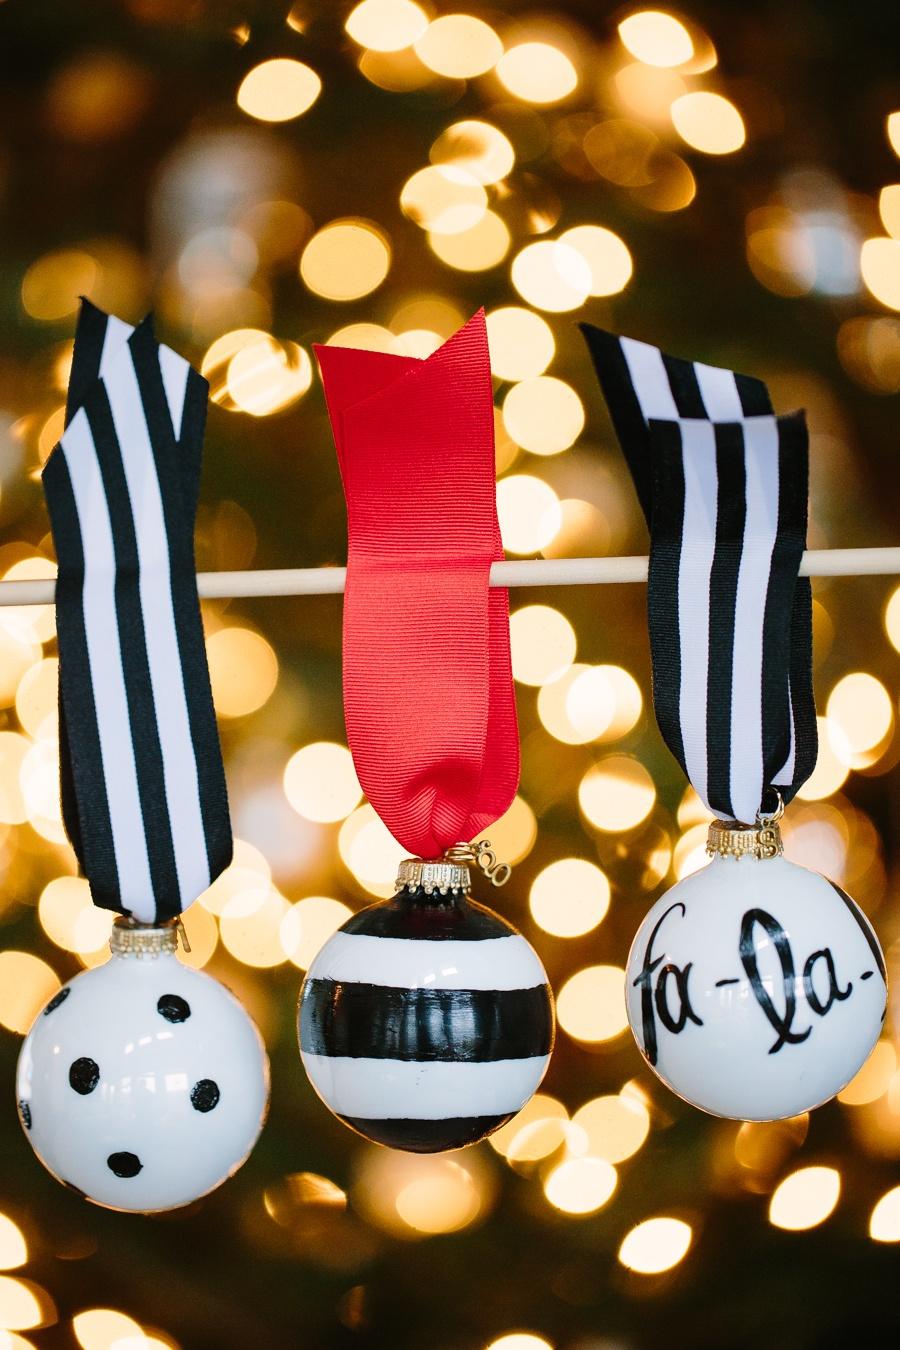 Black and White Ornaments a la Kate Spade